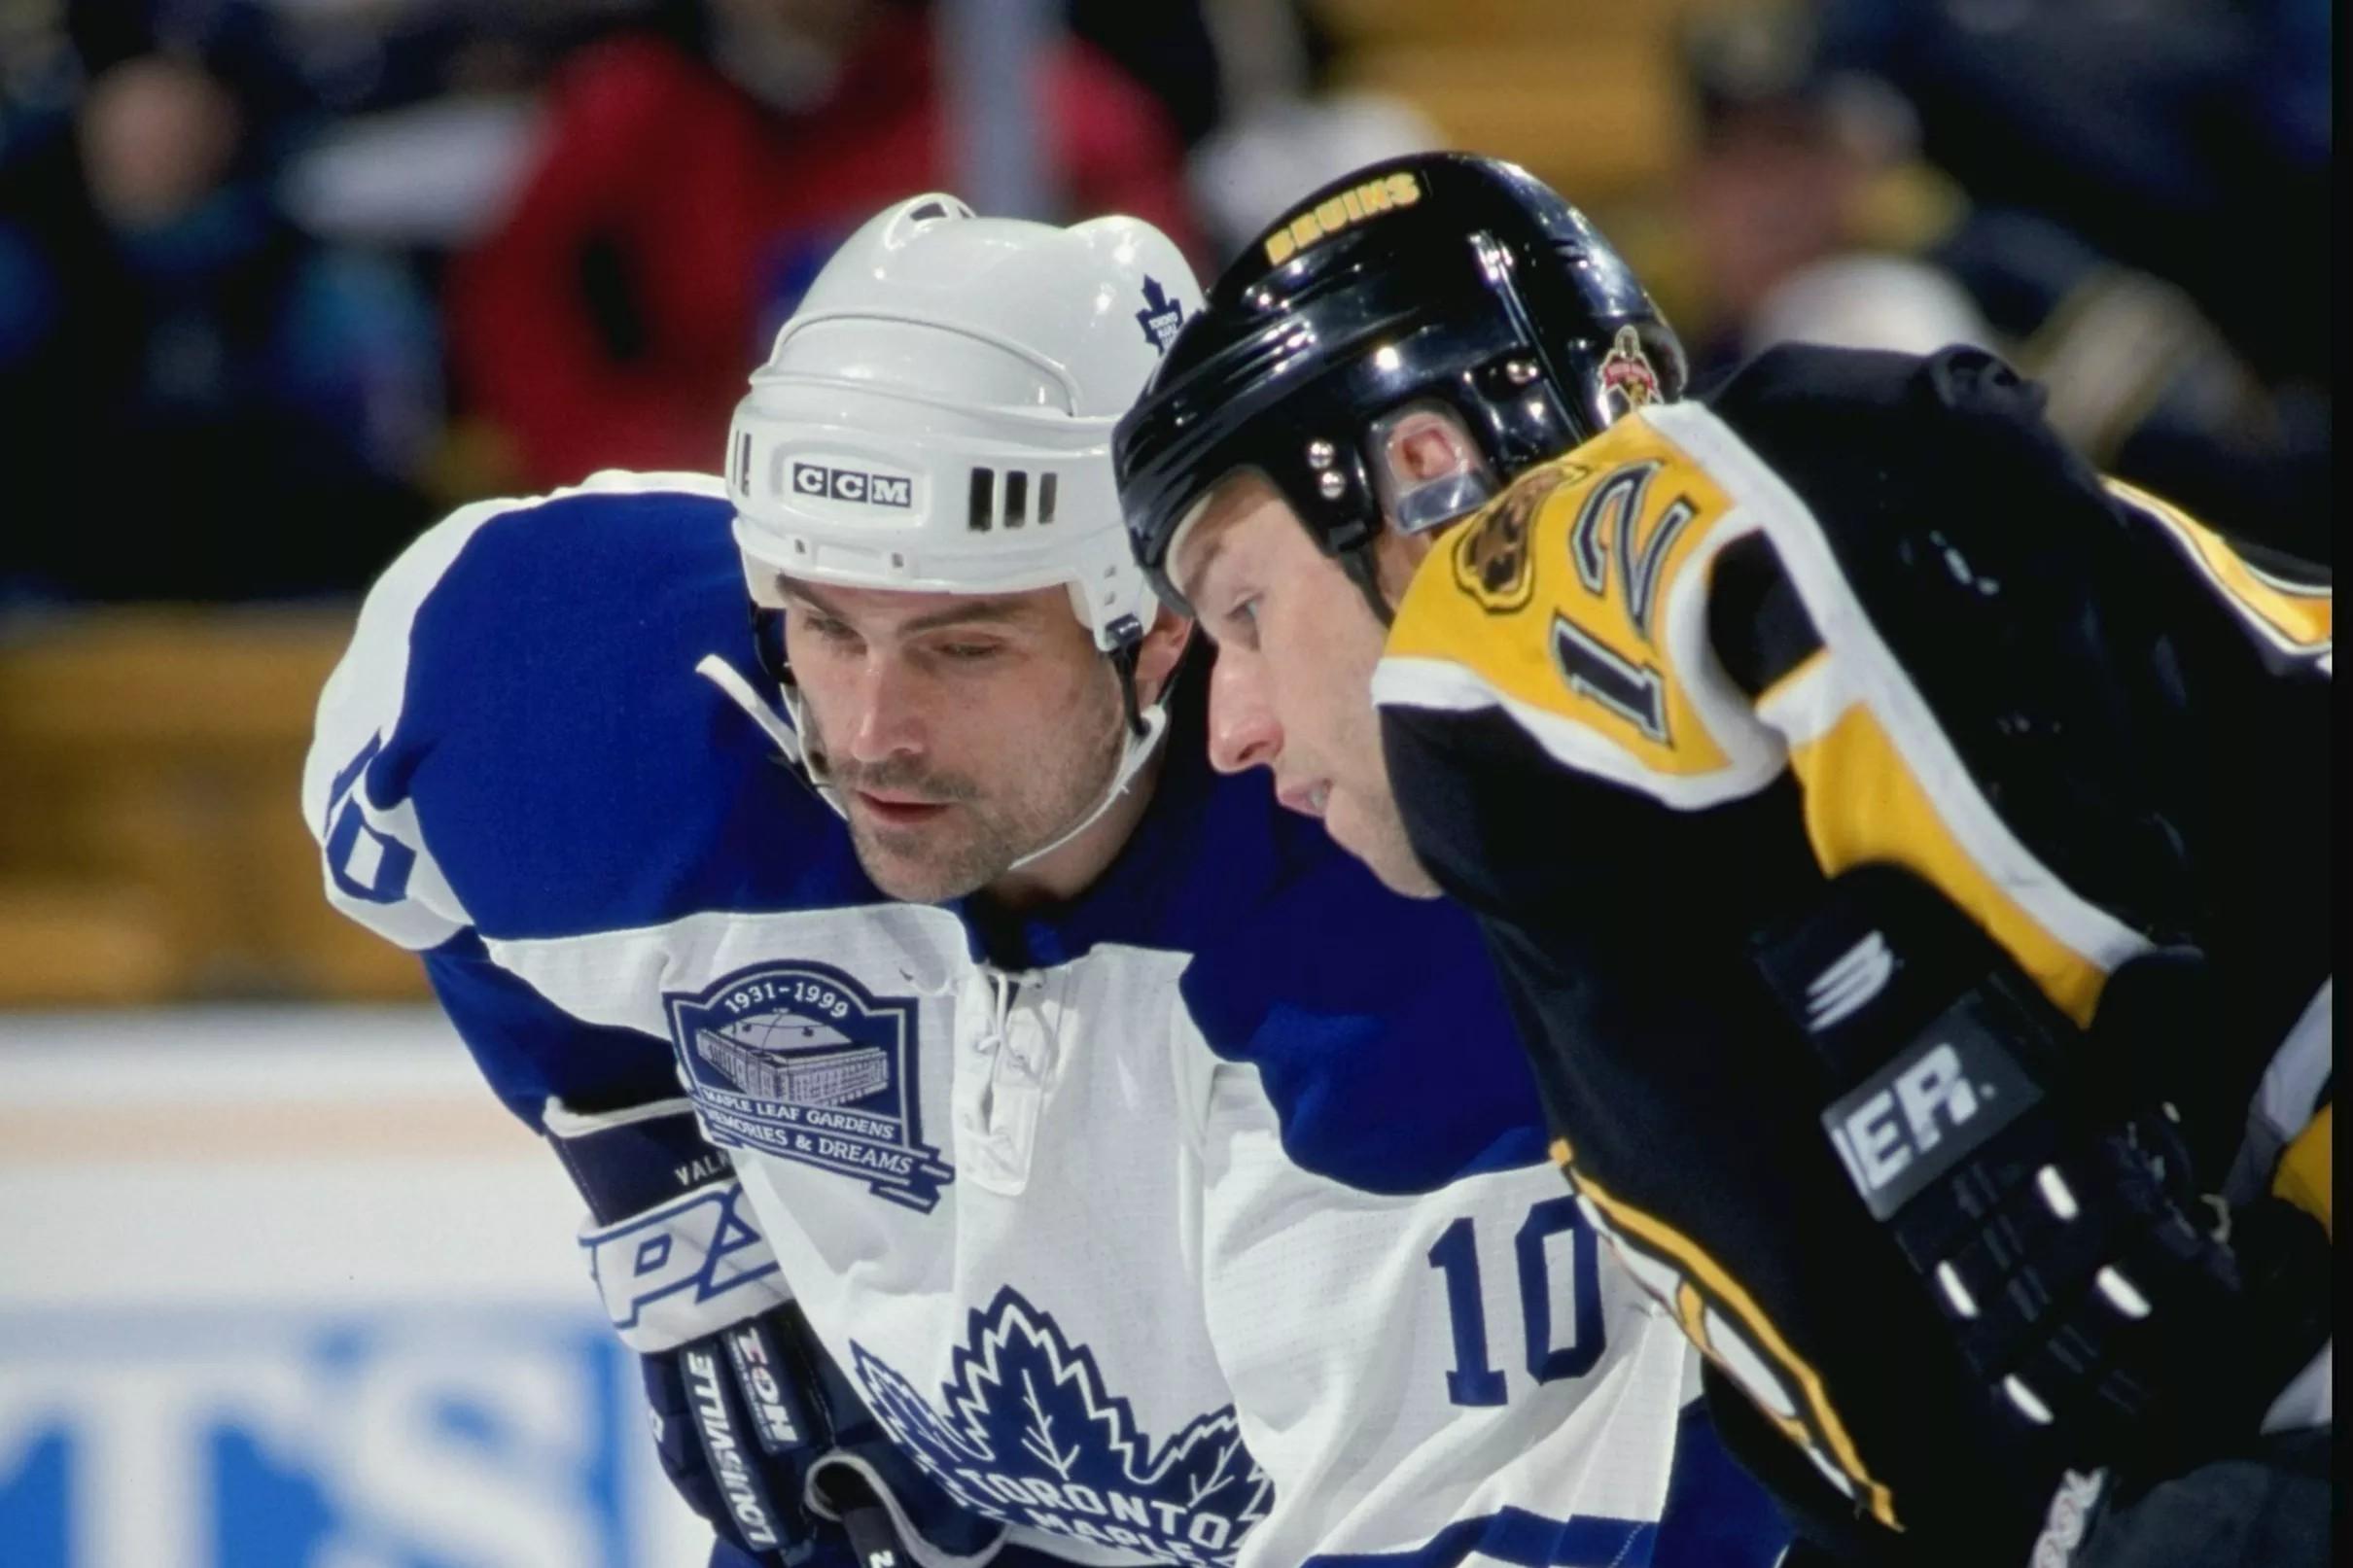 Nhl Playoff History Toronto Maple Leafs Vs Boston Bruins